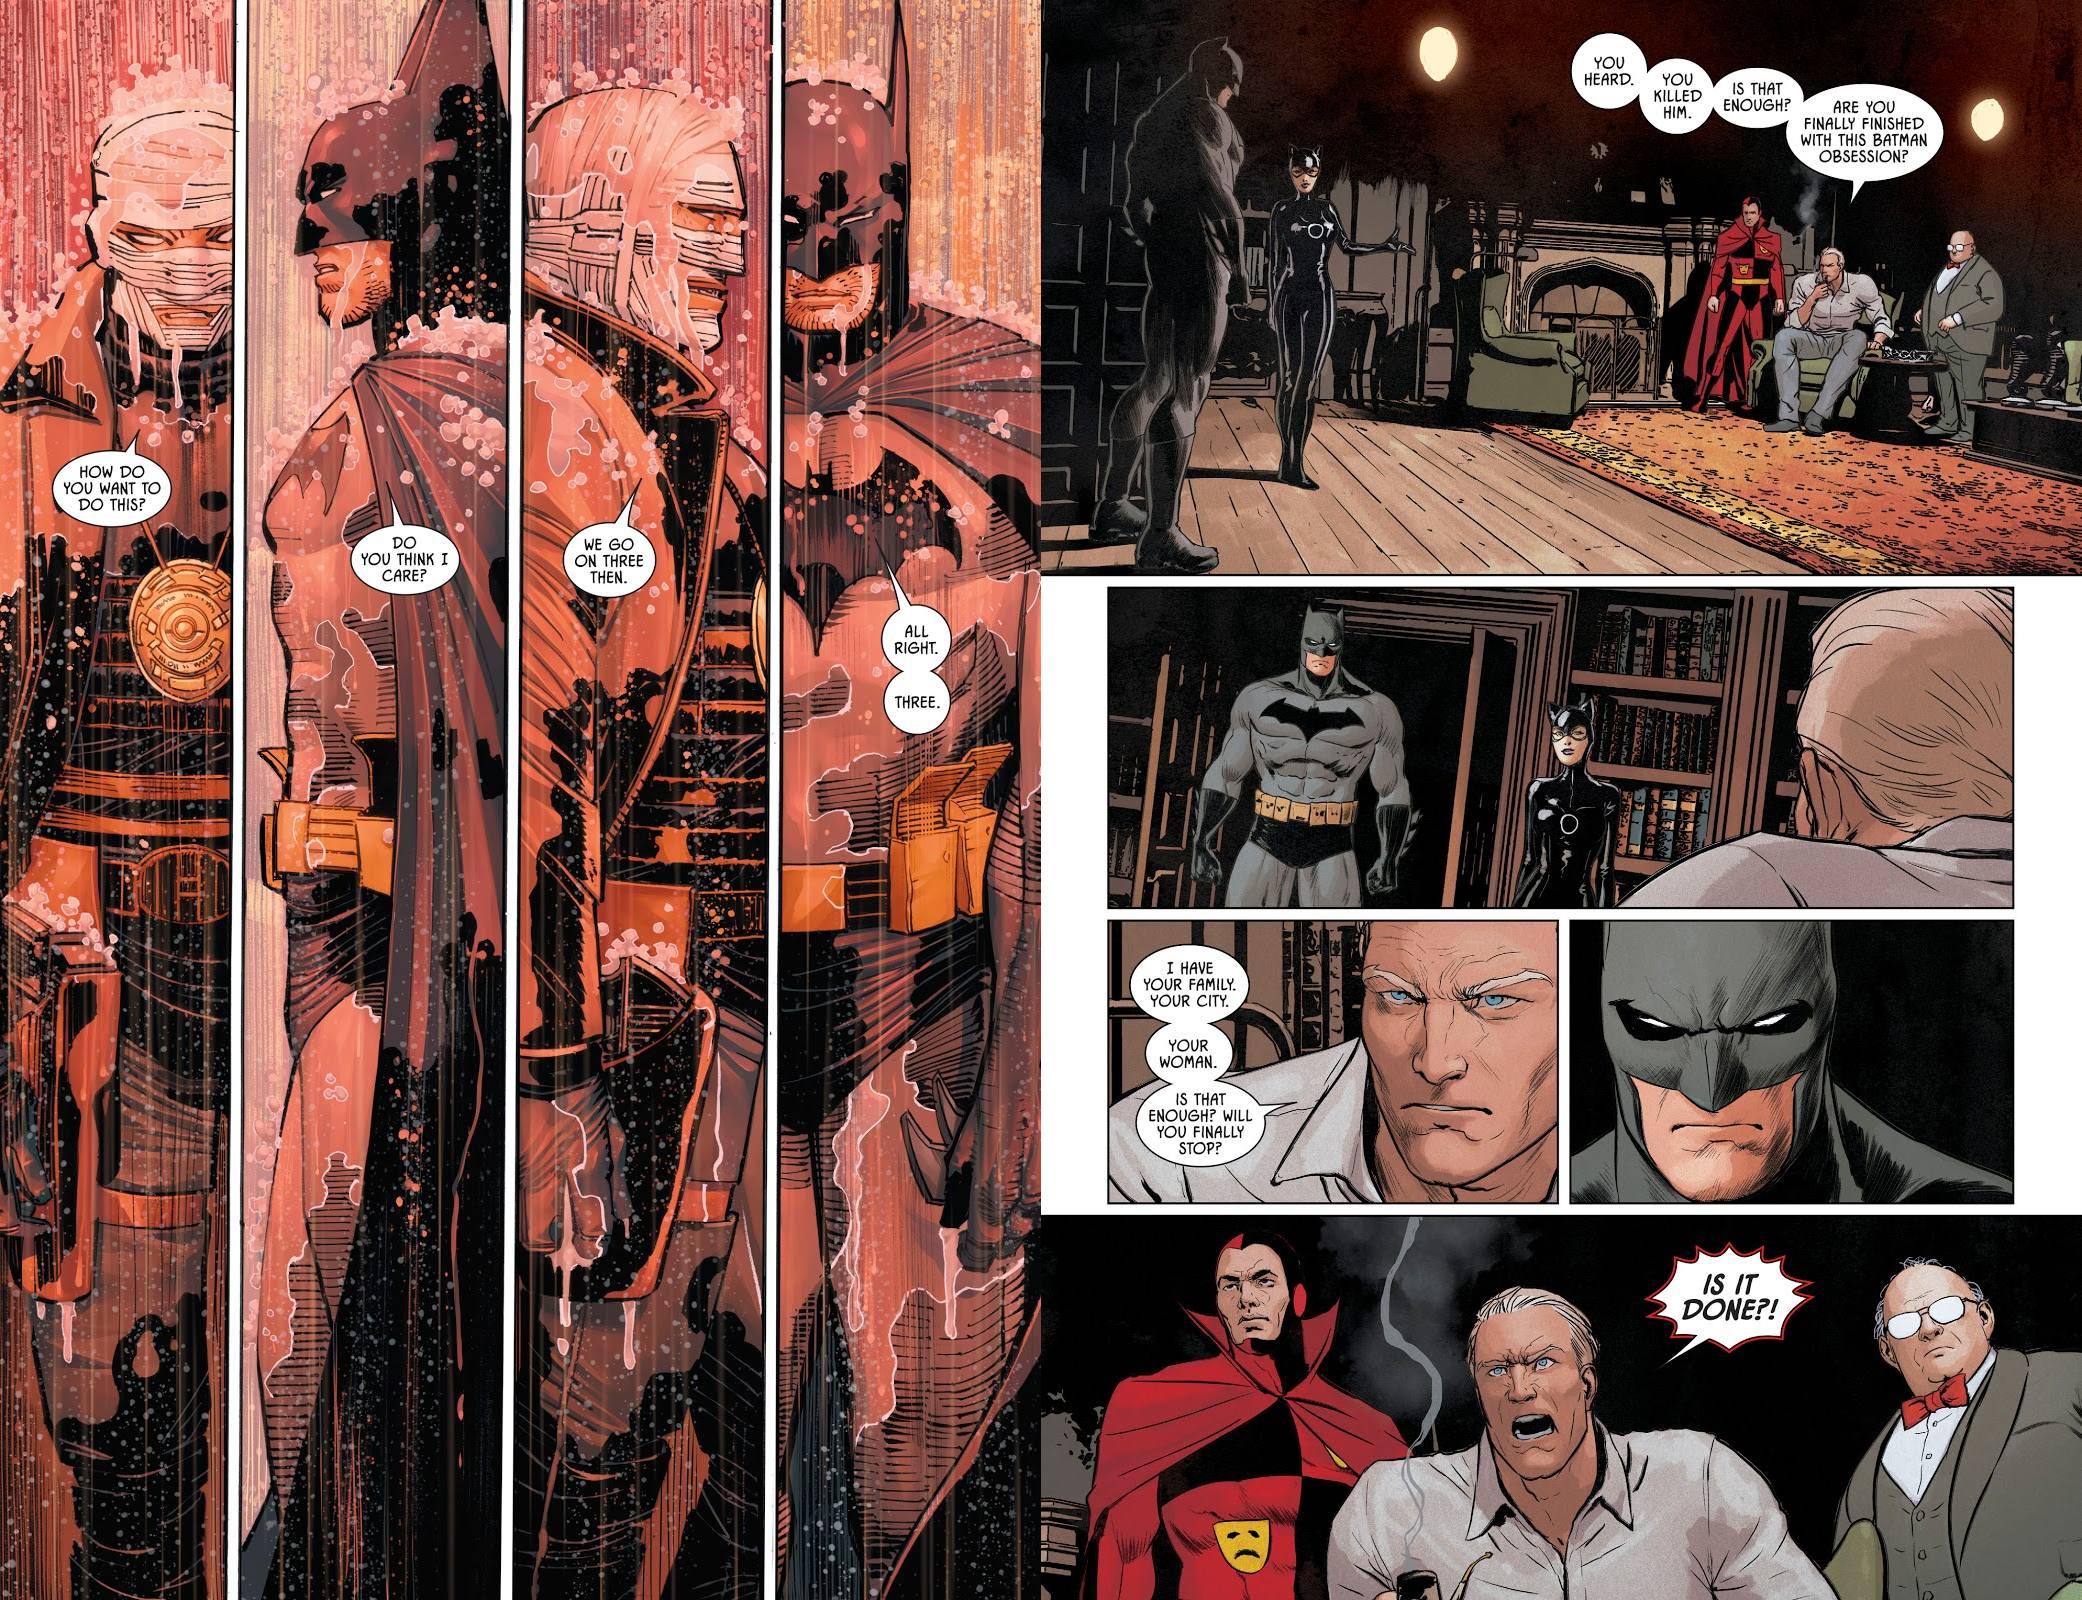 Batman V13 City of Bane review